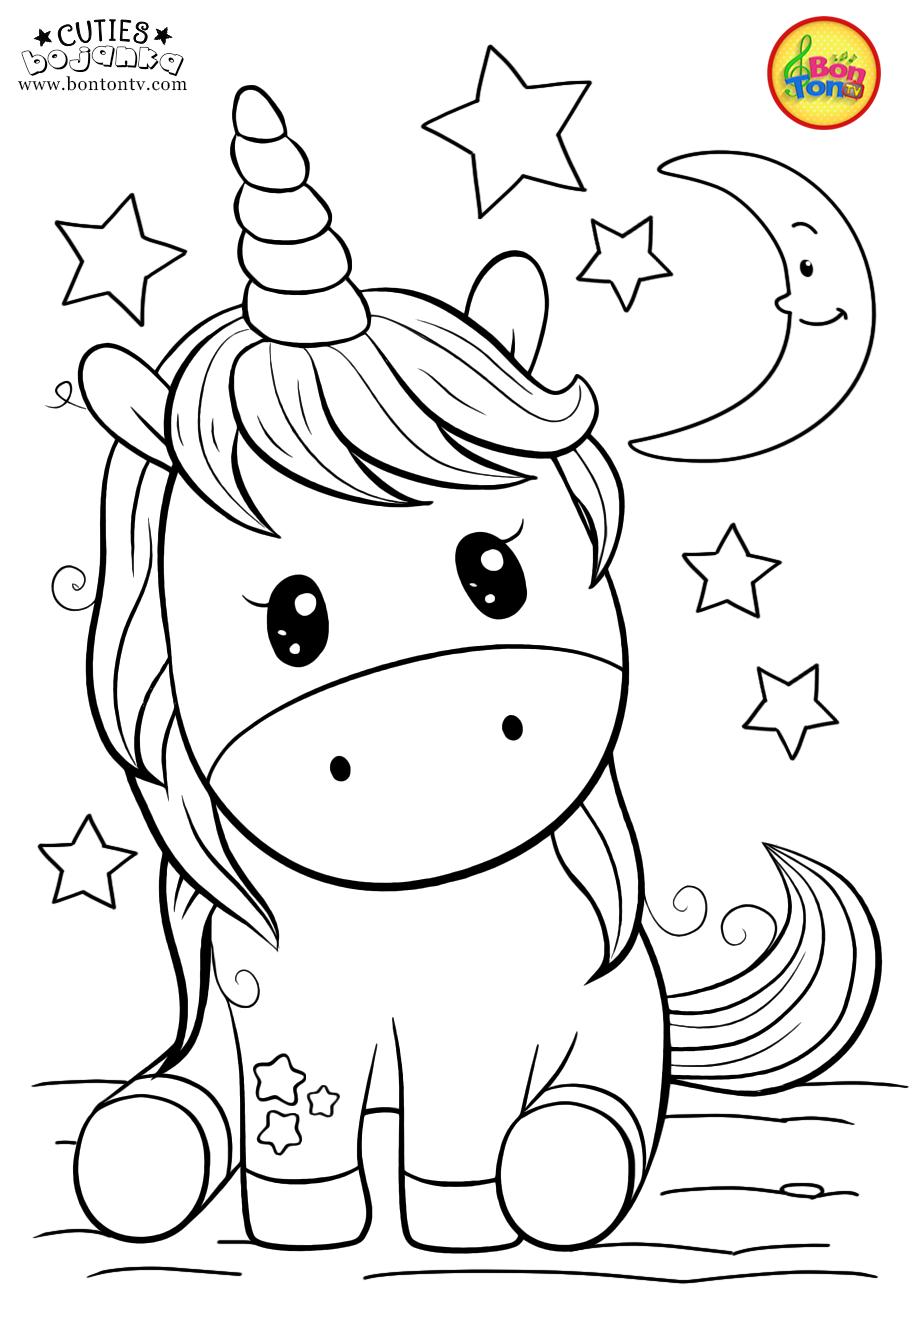 Cuties Coloring Pages For Kids Free Preschool Printables Slatkice Bojanke Cute Animal Unicorn Coloring Pages Animal Coloring Pages Spring Coloring Pages